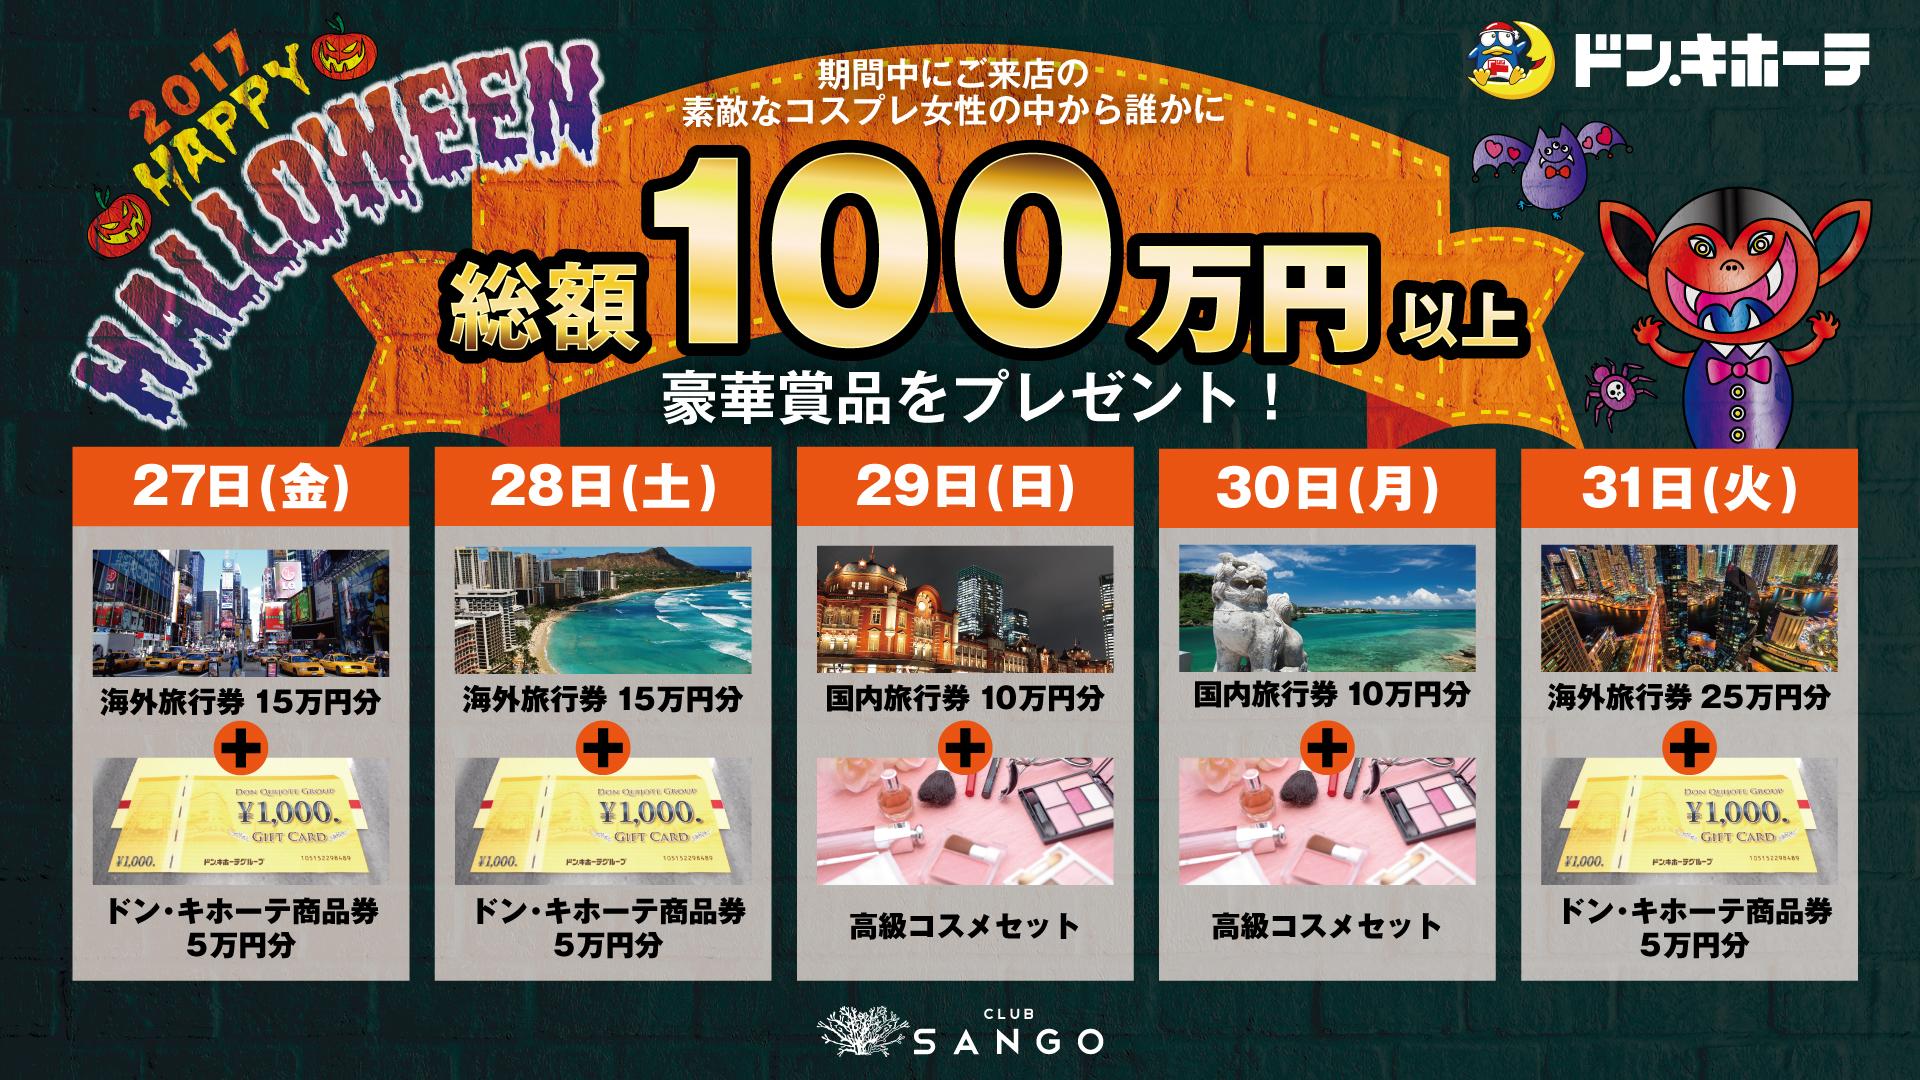 2017 HAPPY HALLOWEEN 総額100万円以上豪華賞品プレゼント!